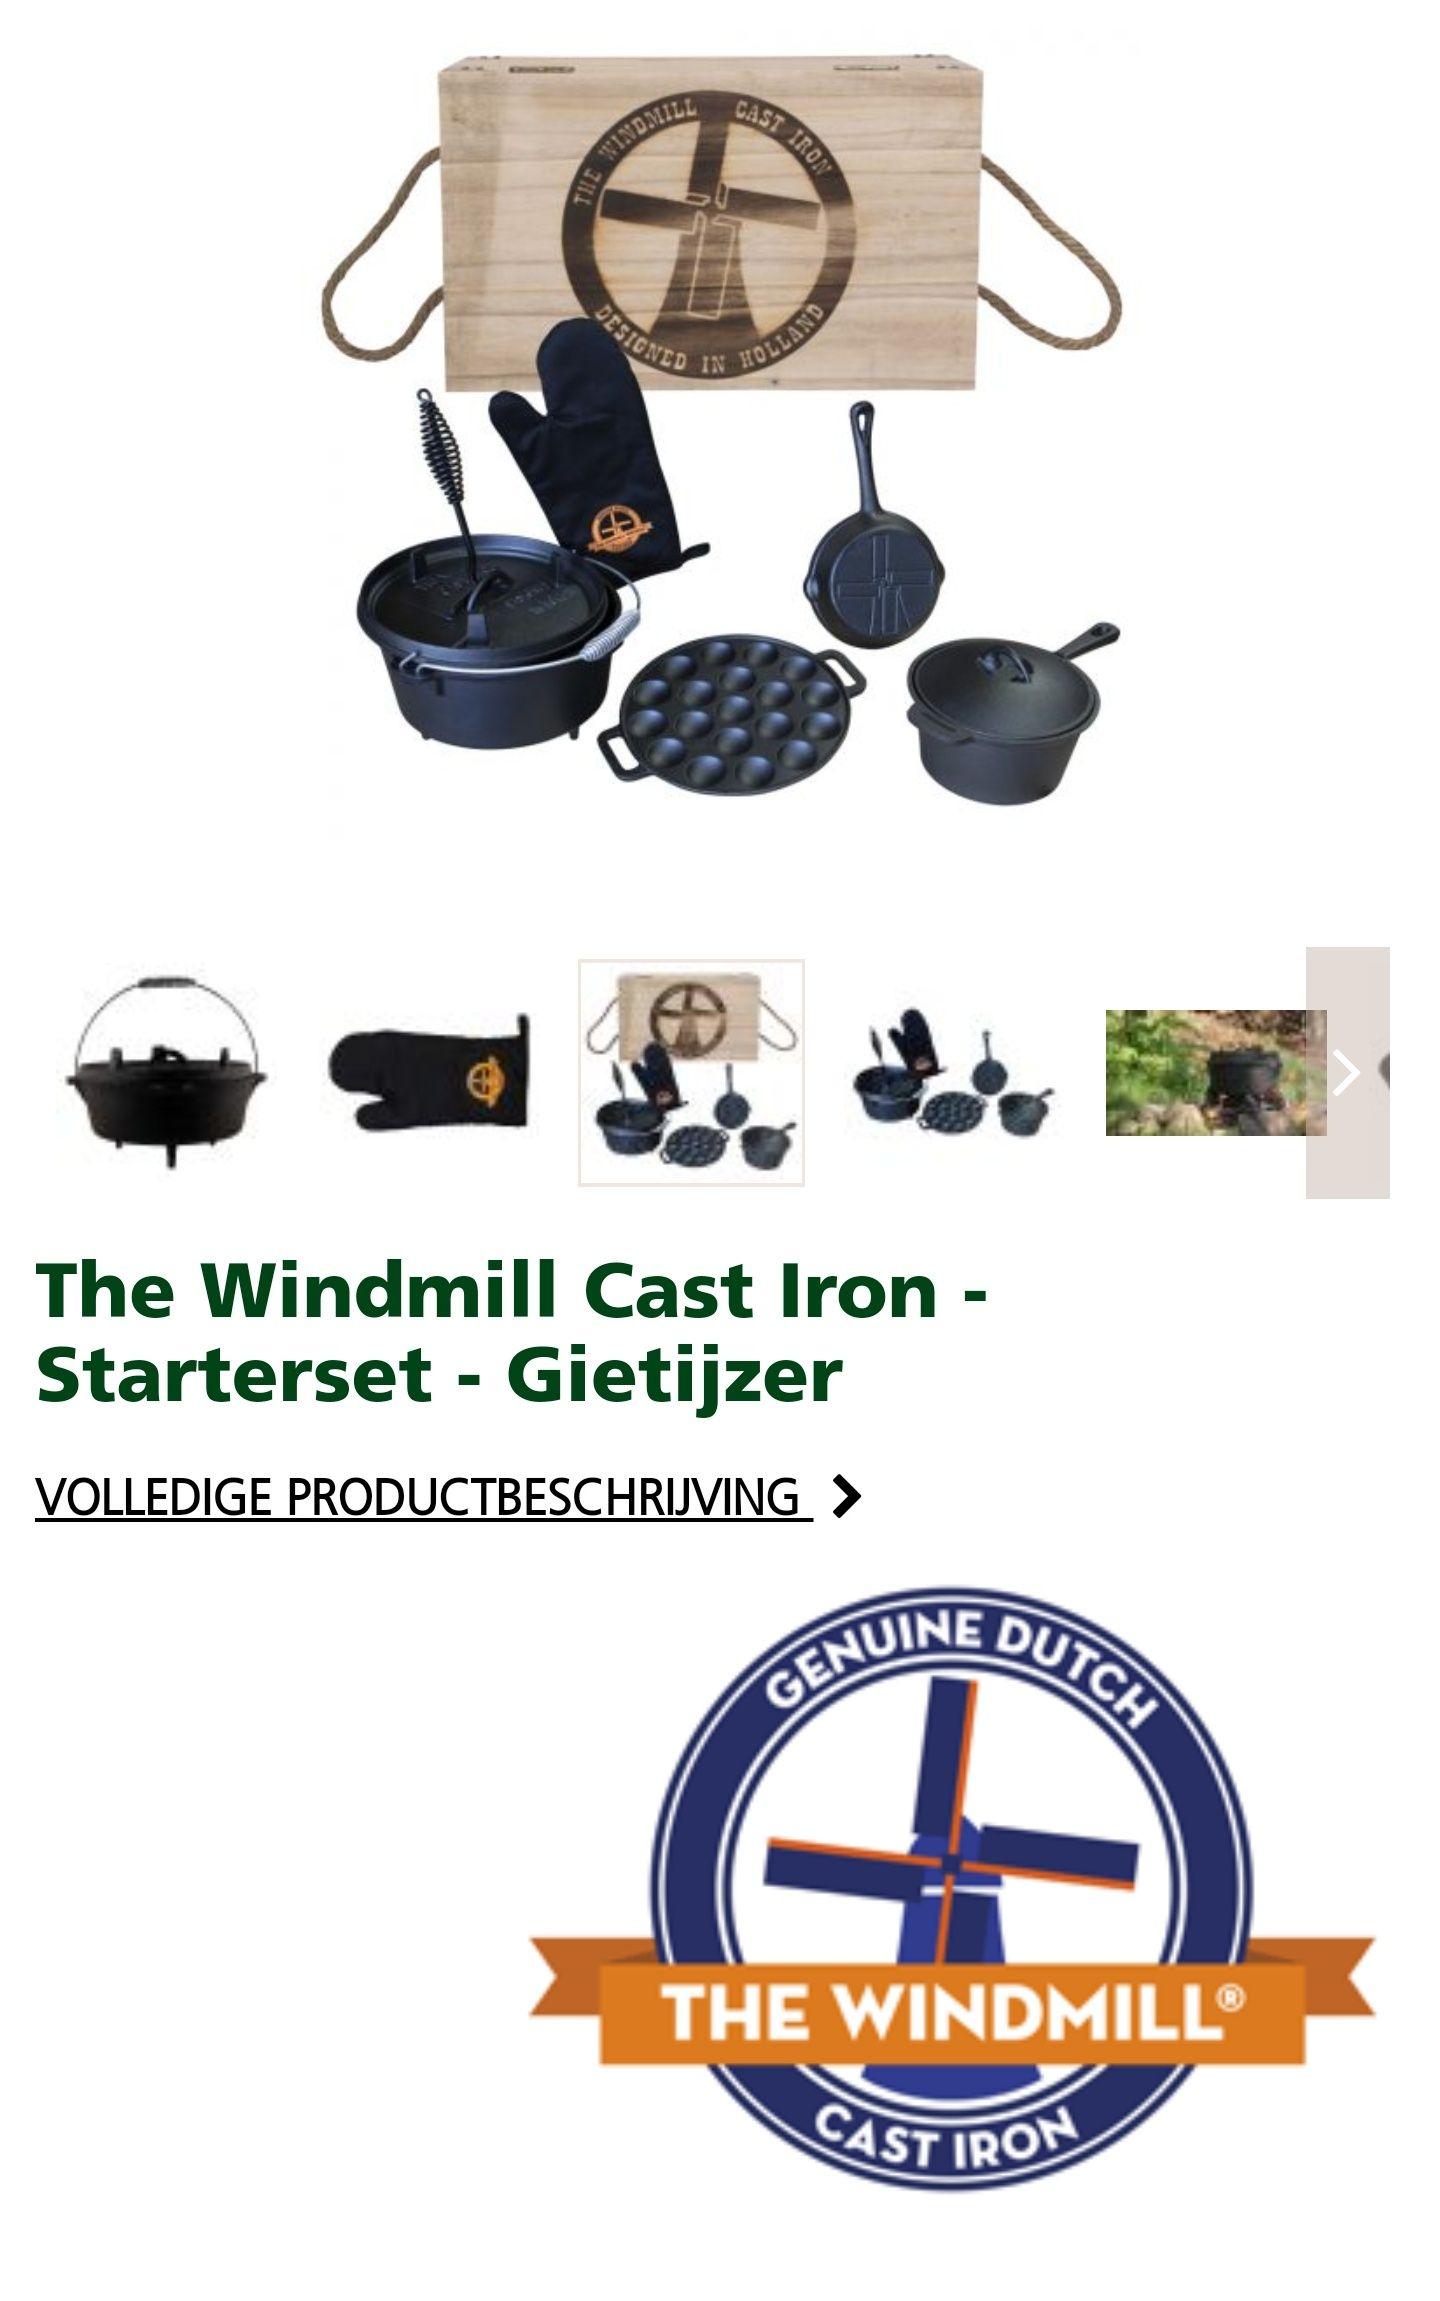 The Windmill Cast Iron Startersset